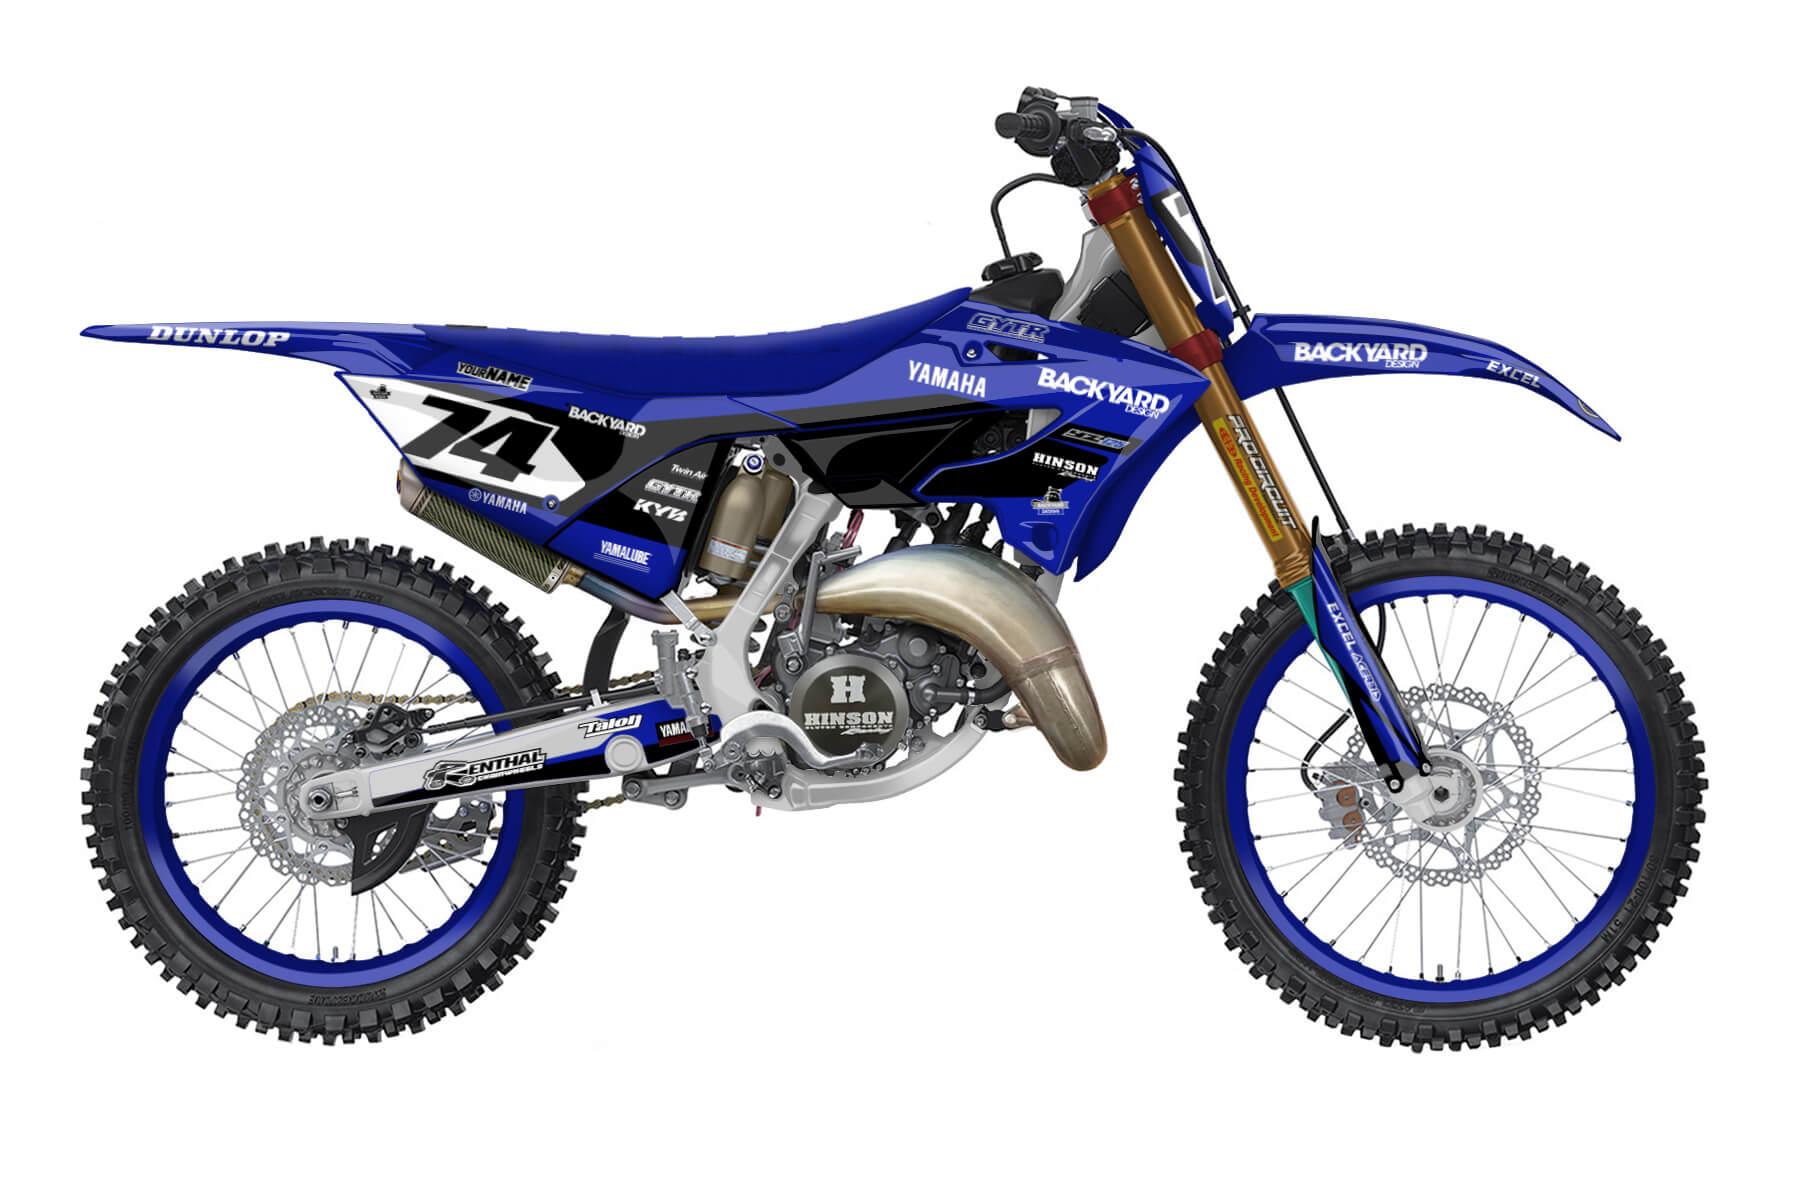 Yamaha YZ 250 - 2022 - Backyard Design - Mx Dekor - General Basic